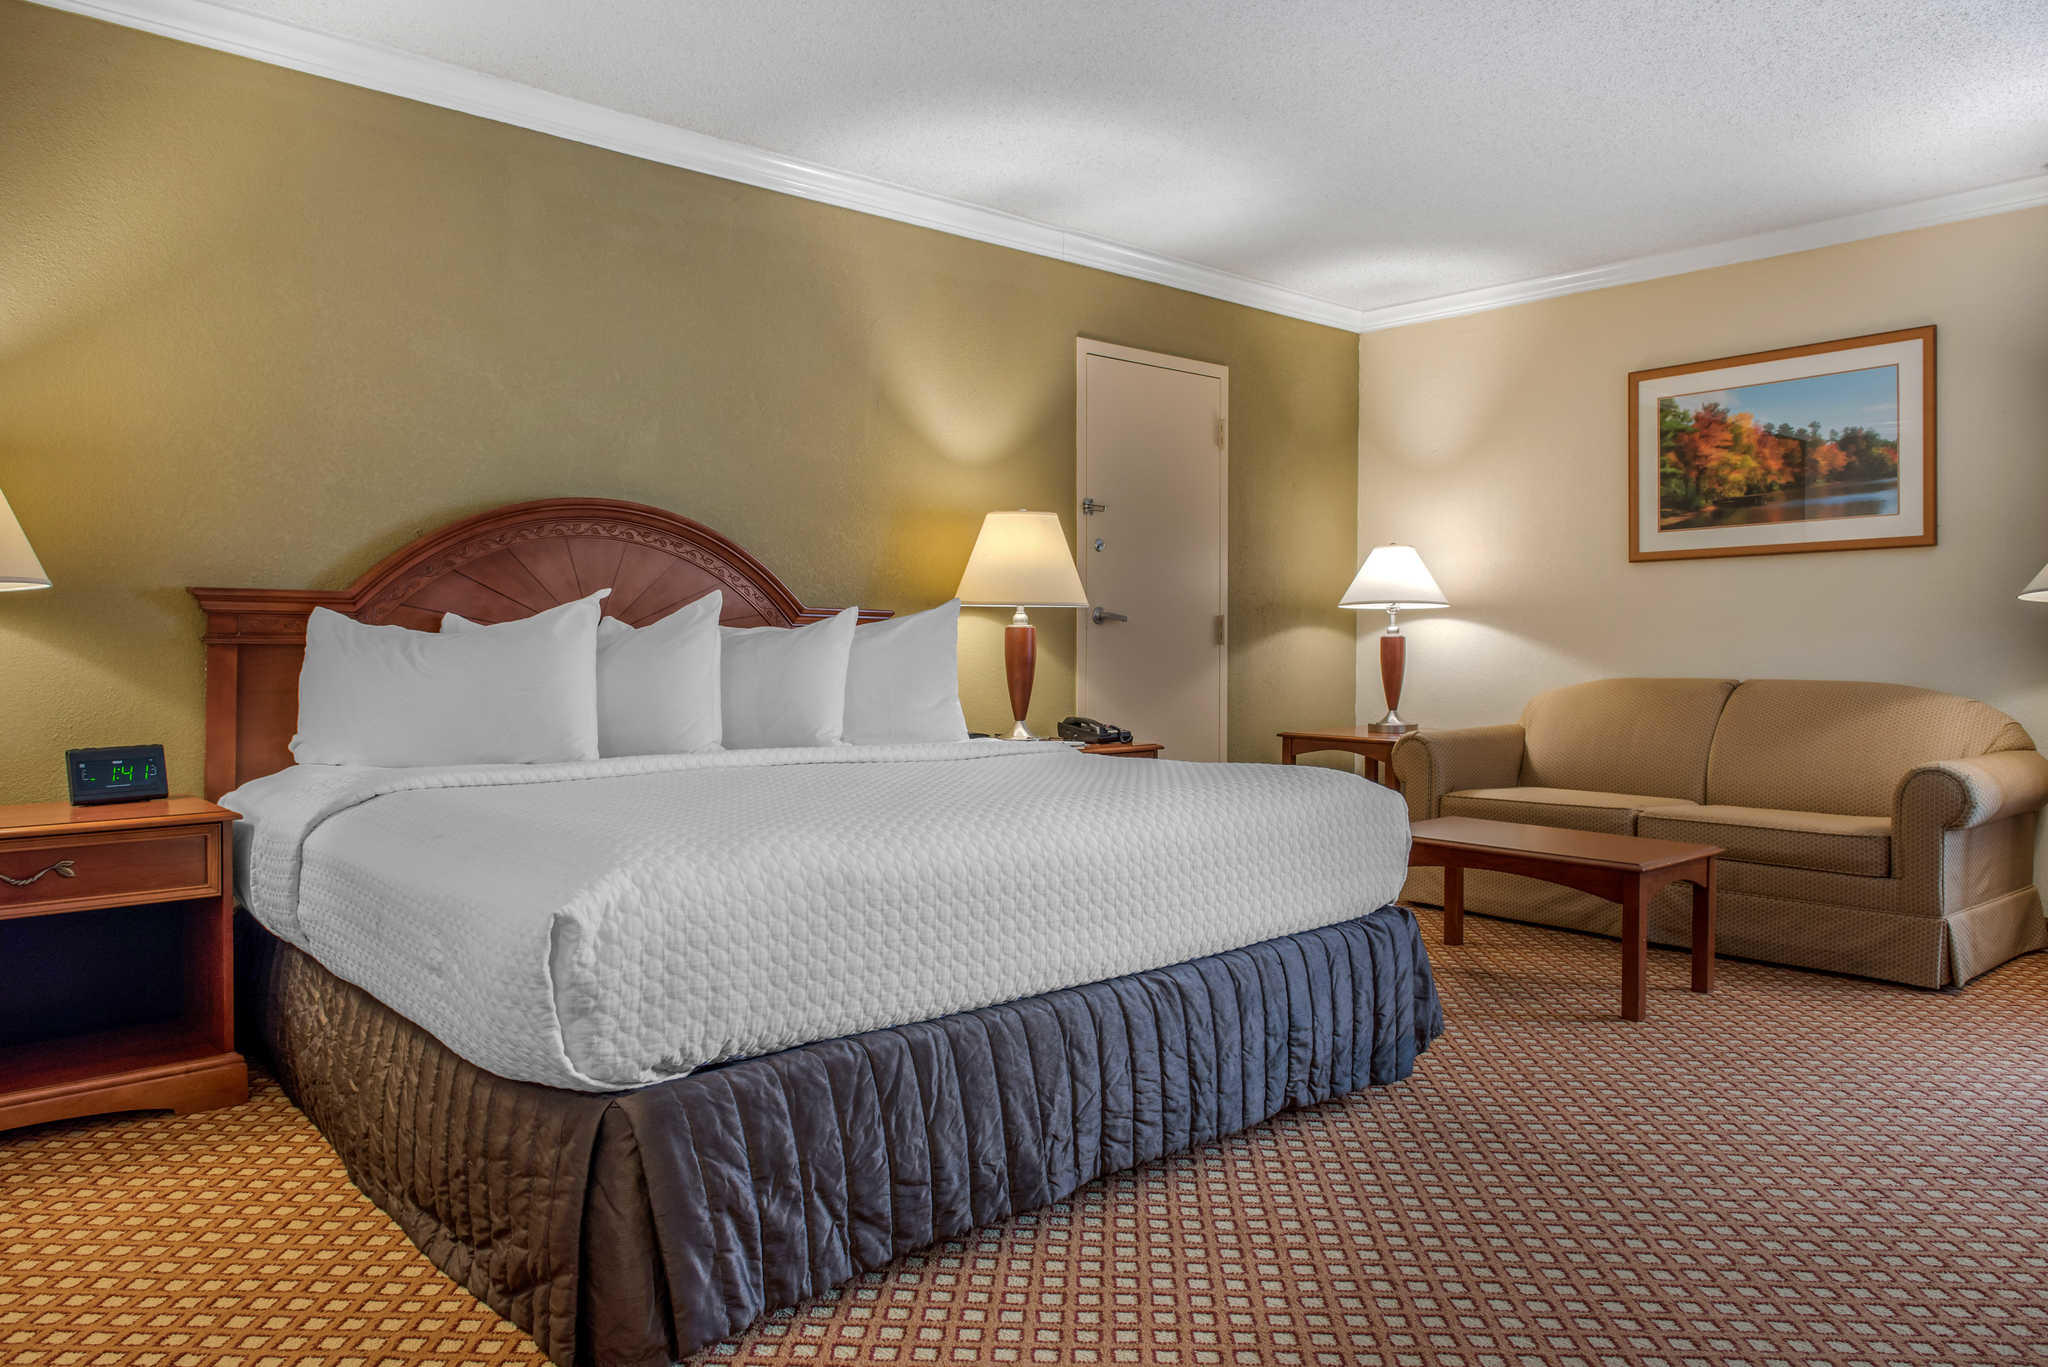 Quality Hotel - Cincinnati Blue Ash image 16